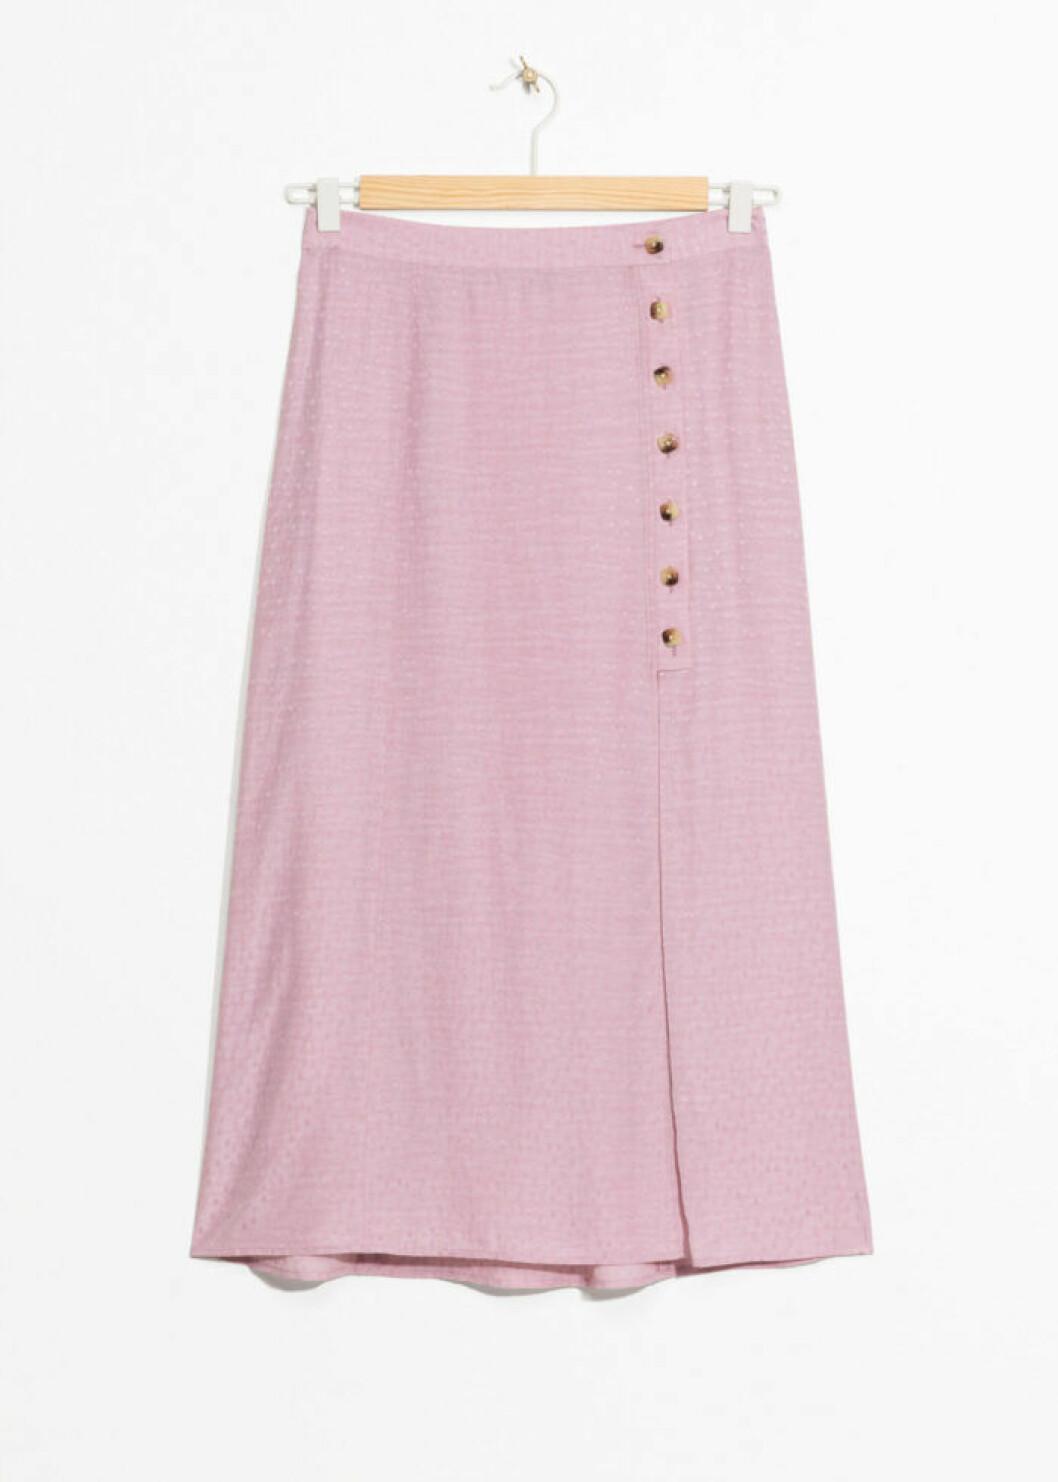 Rosa medellång kjol